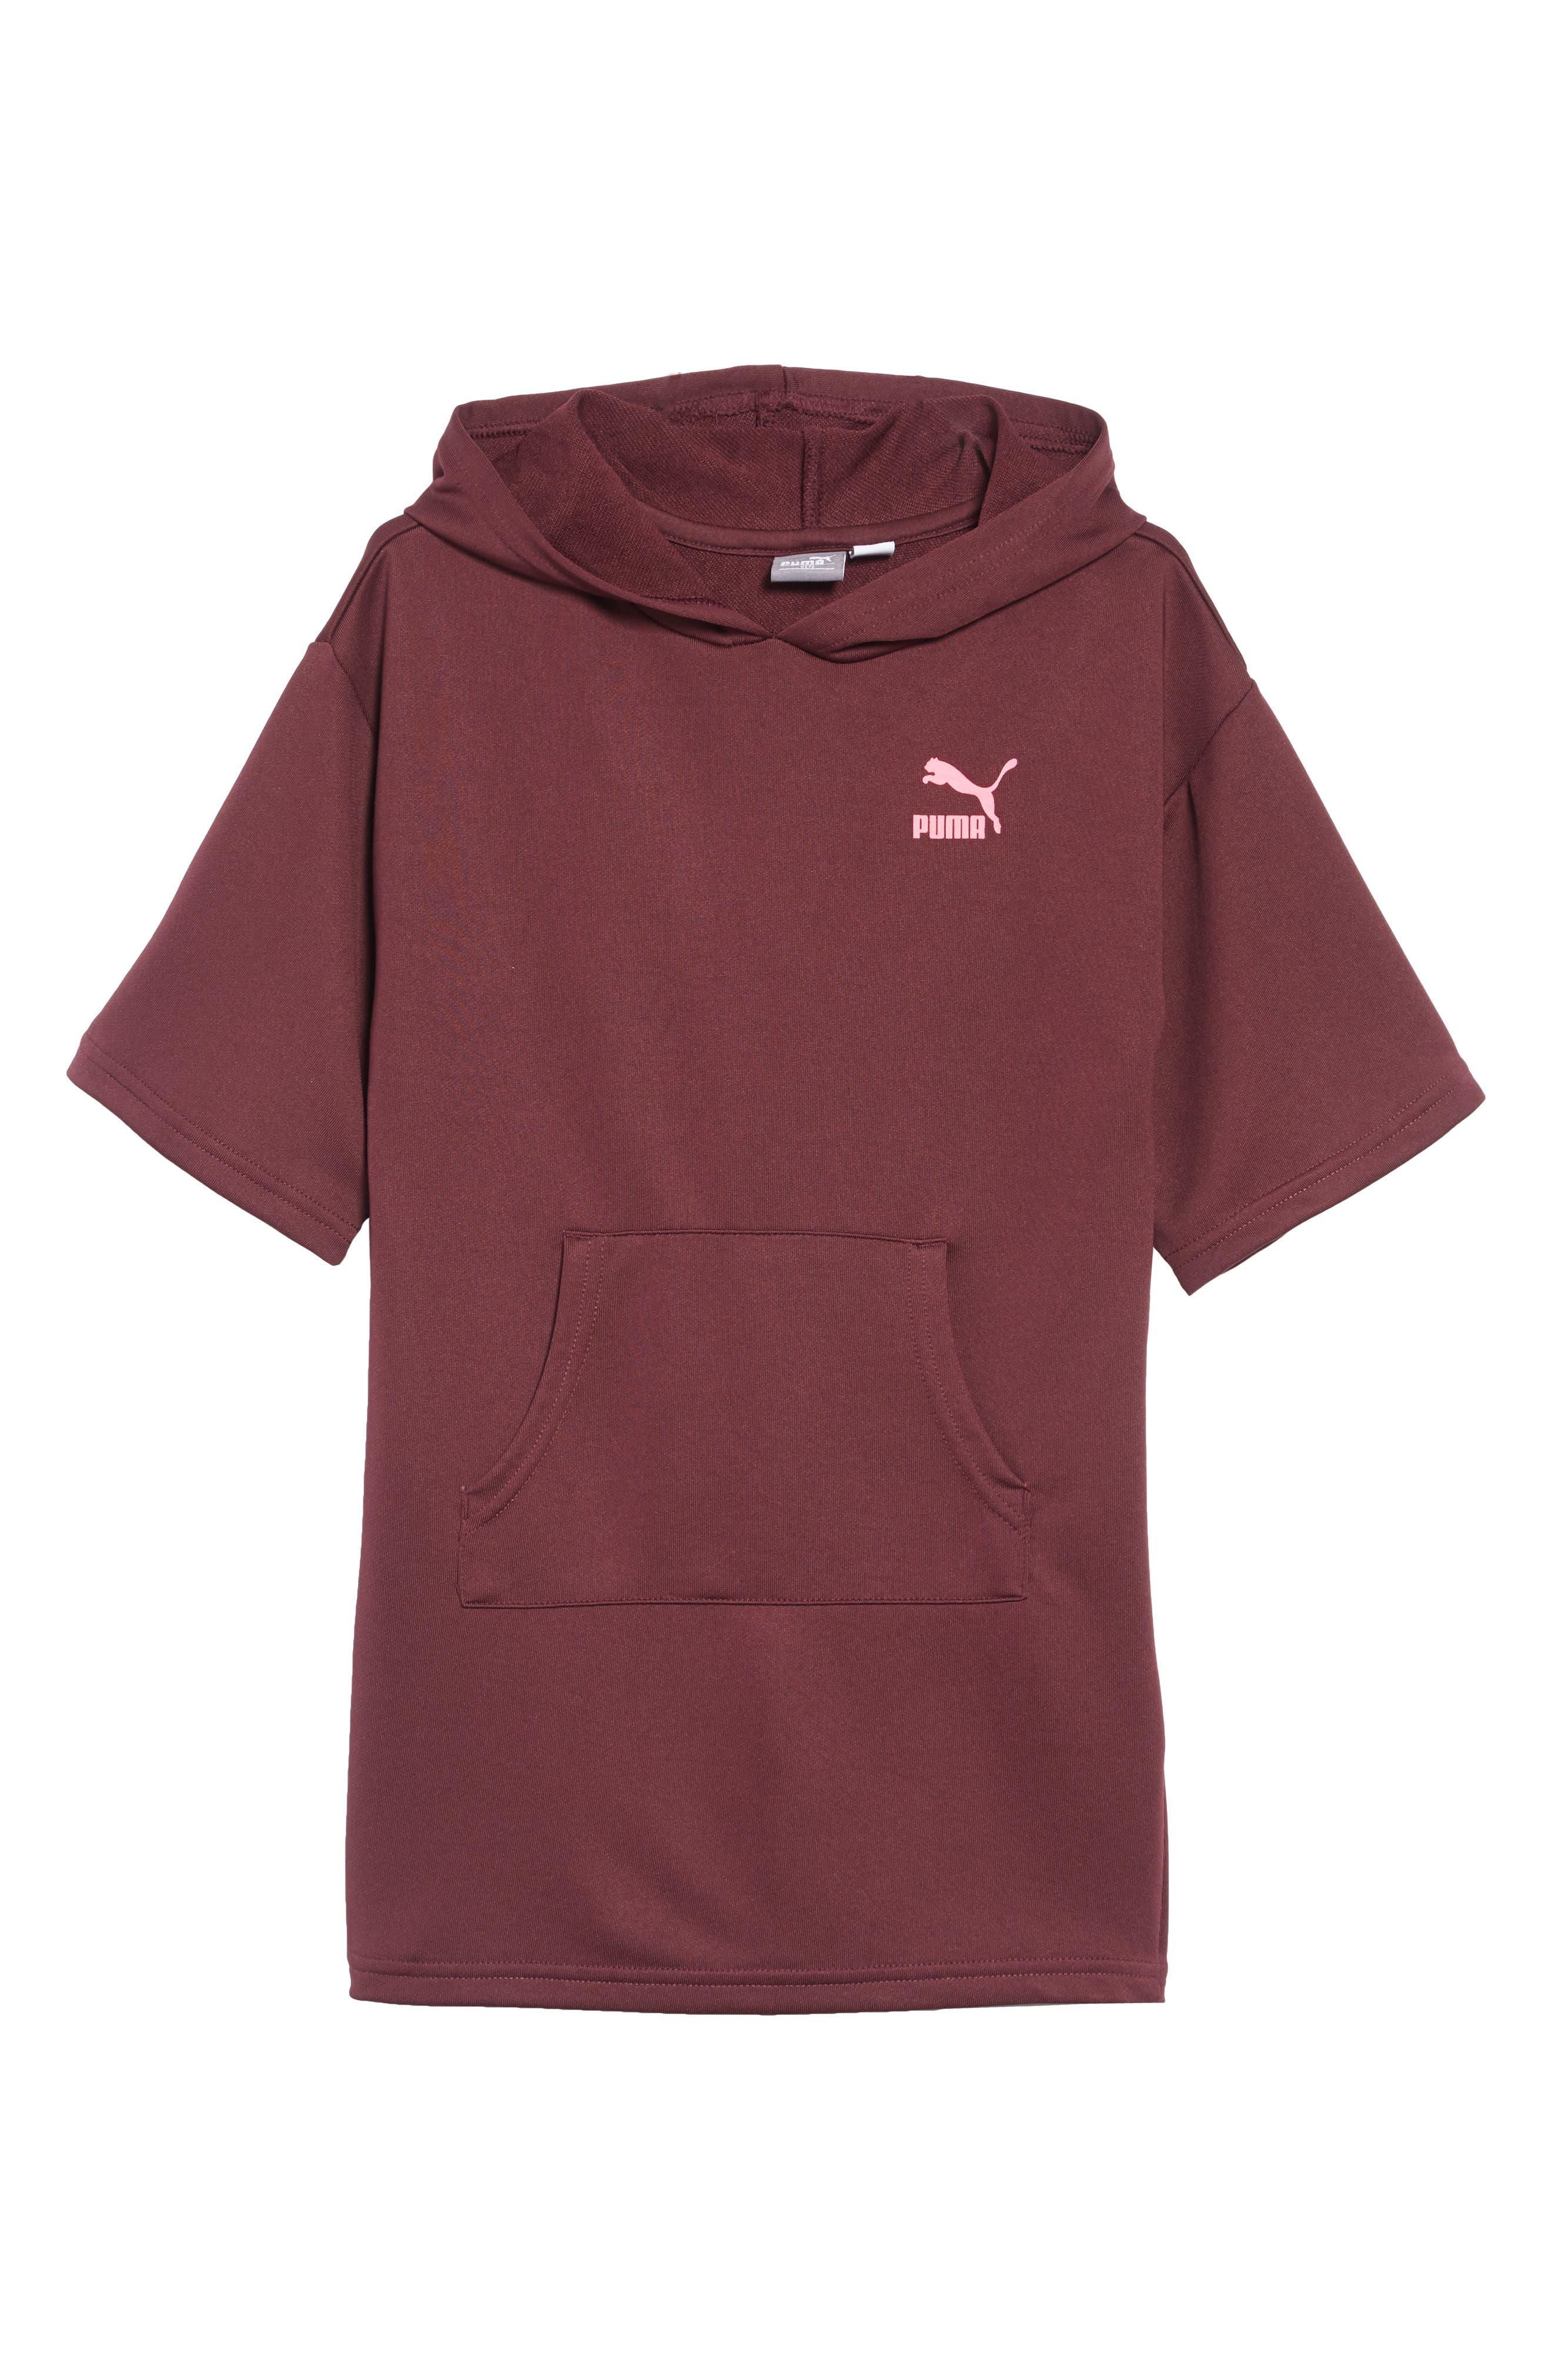 PUMA Oversized Hooded Sweatshirt Dress, Main, color, 597